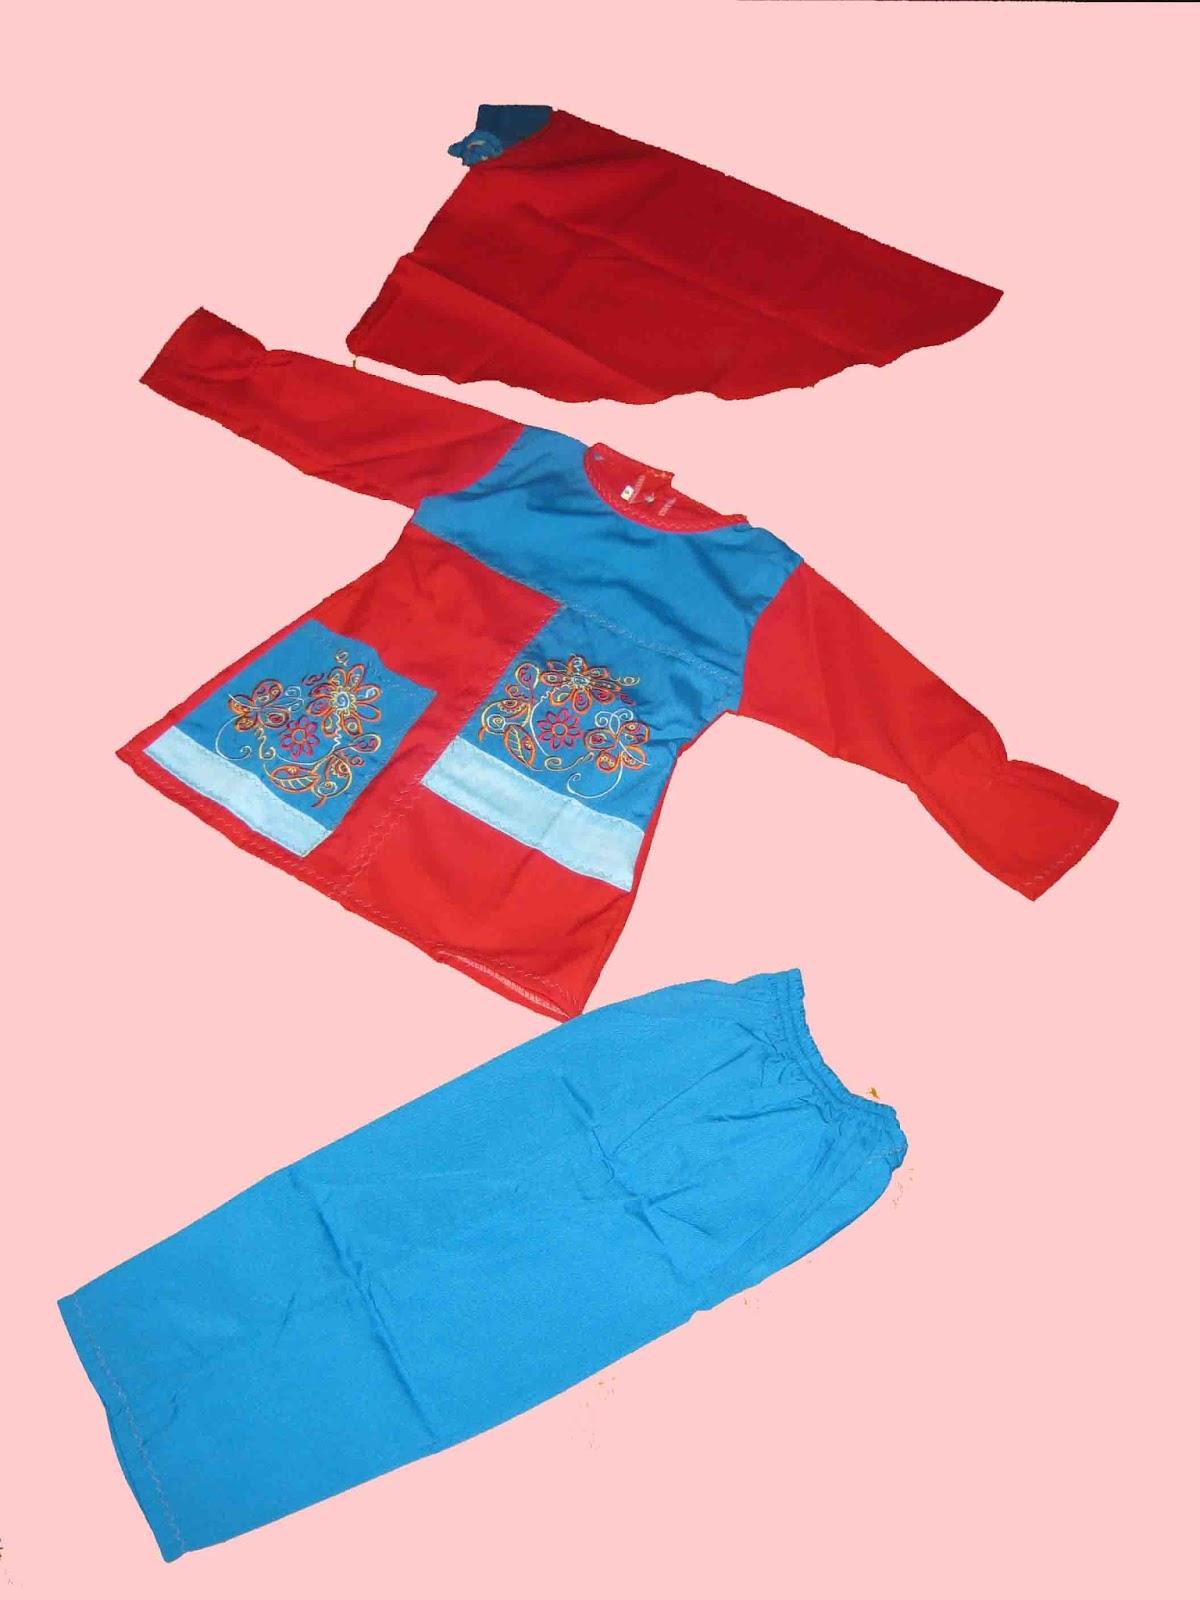 Seragam Baju Muslim Seragam Paud Tk Model Stelan Celana